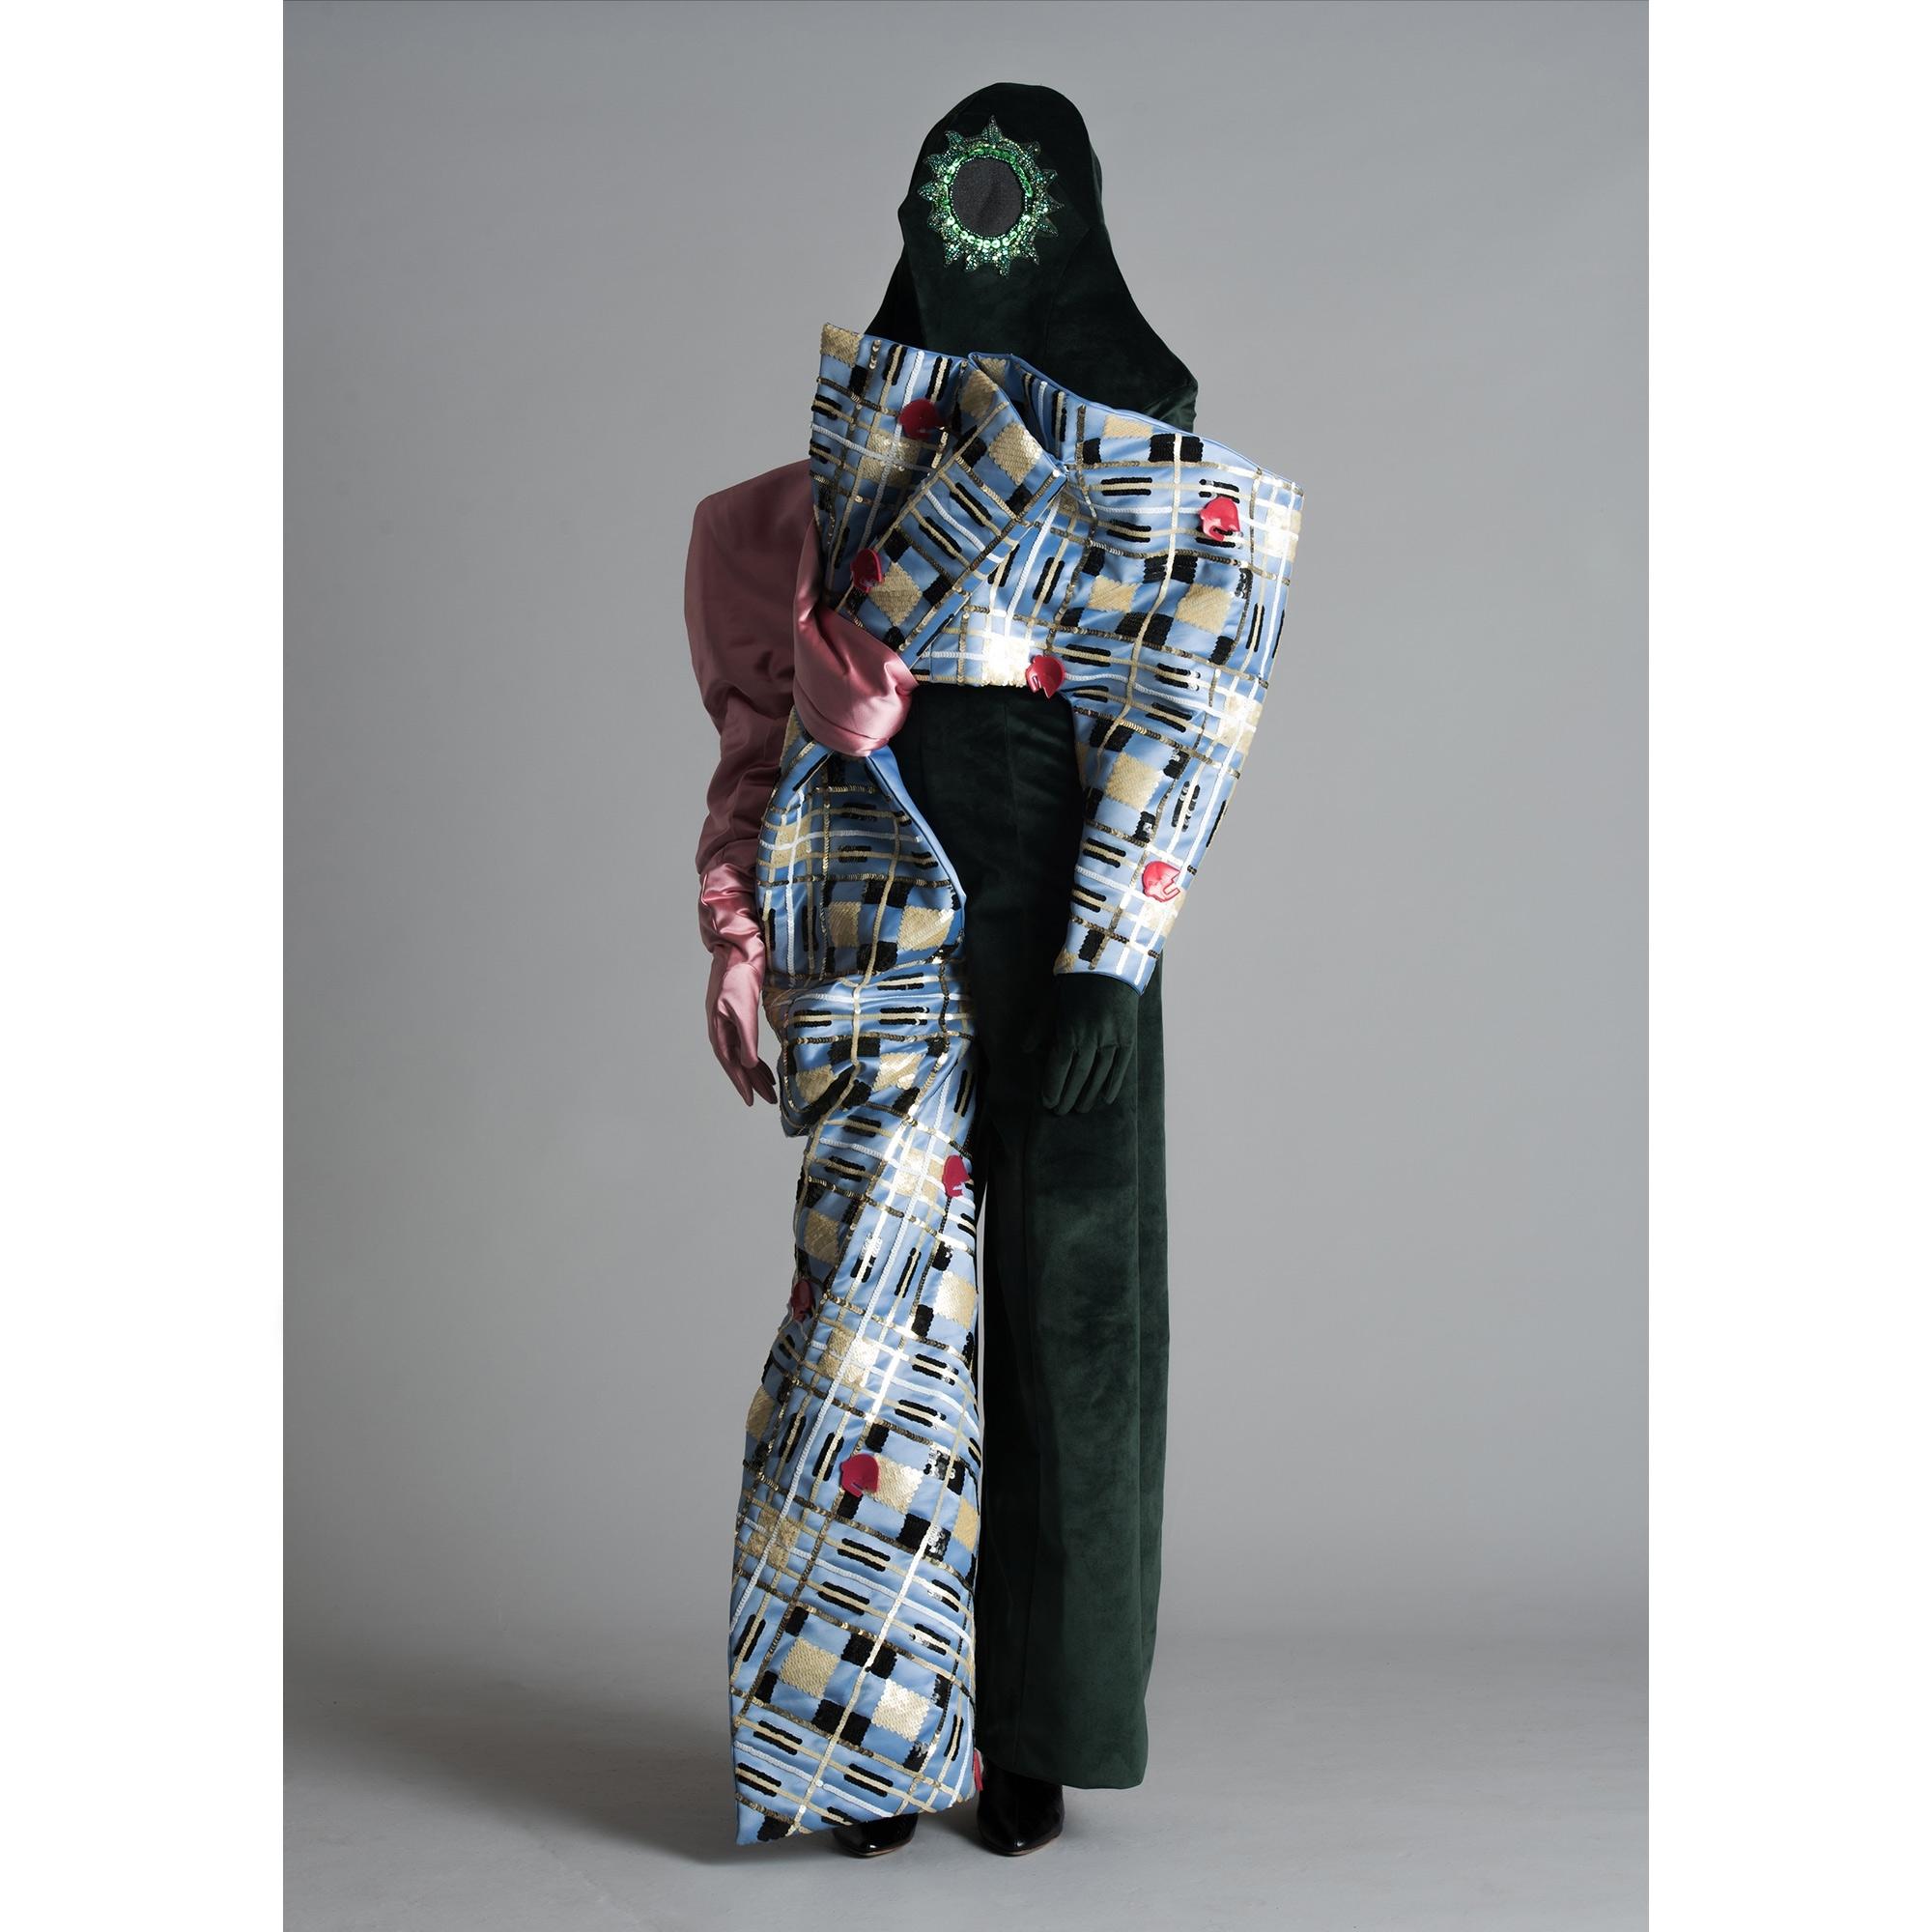 974a89920f5 VINCENT LAPP Made To Order Tartan Velvet Jumpsuit - WOMEN from ...